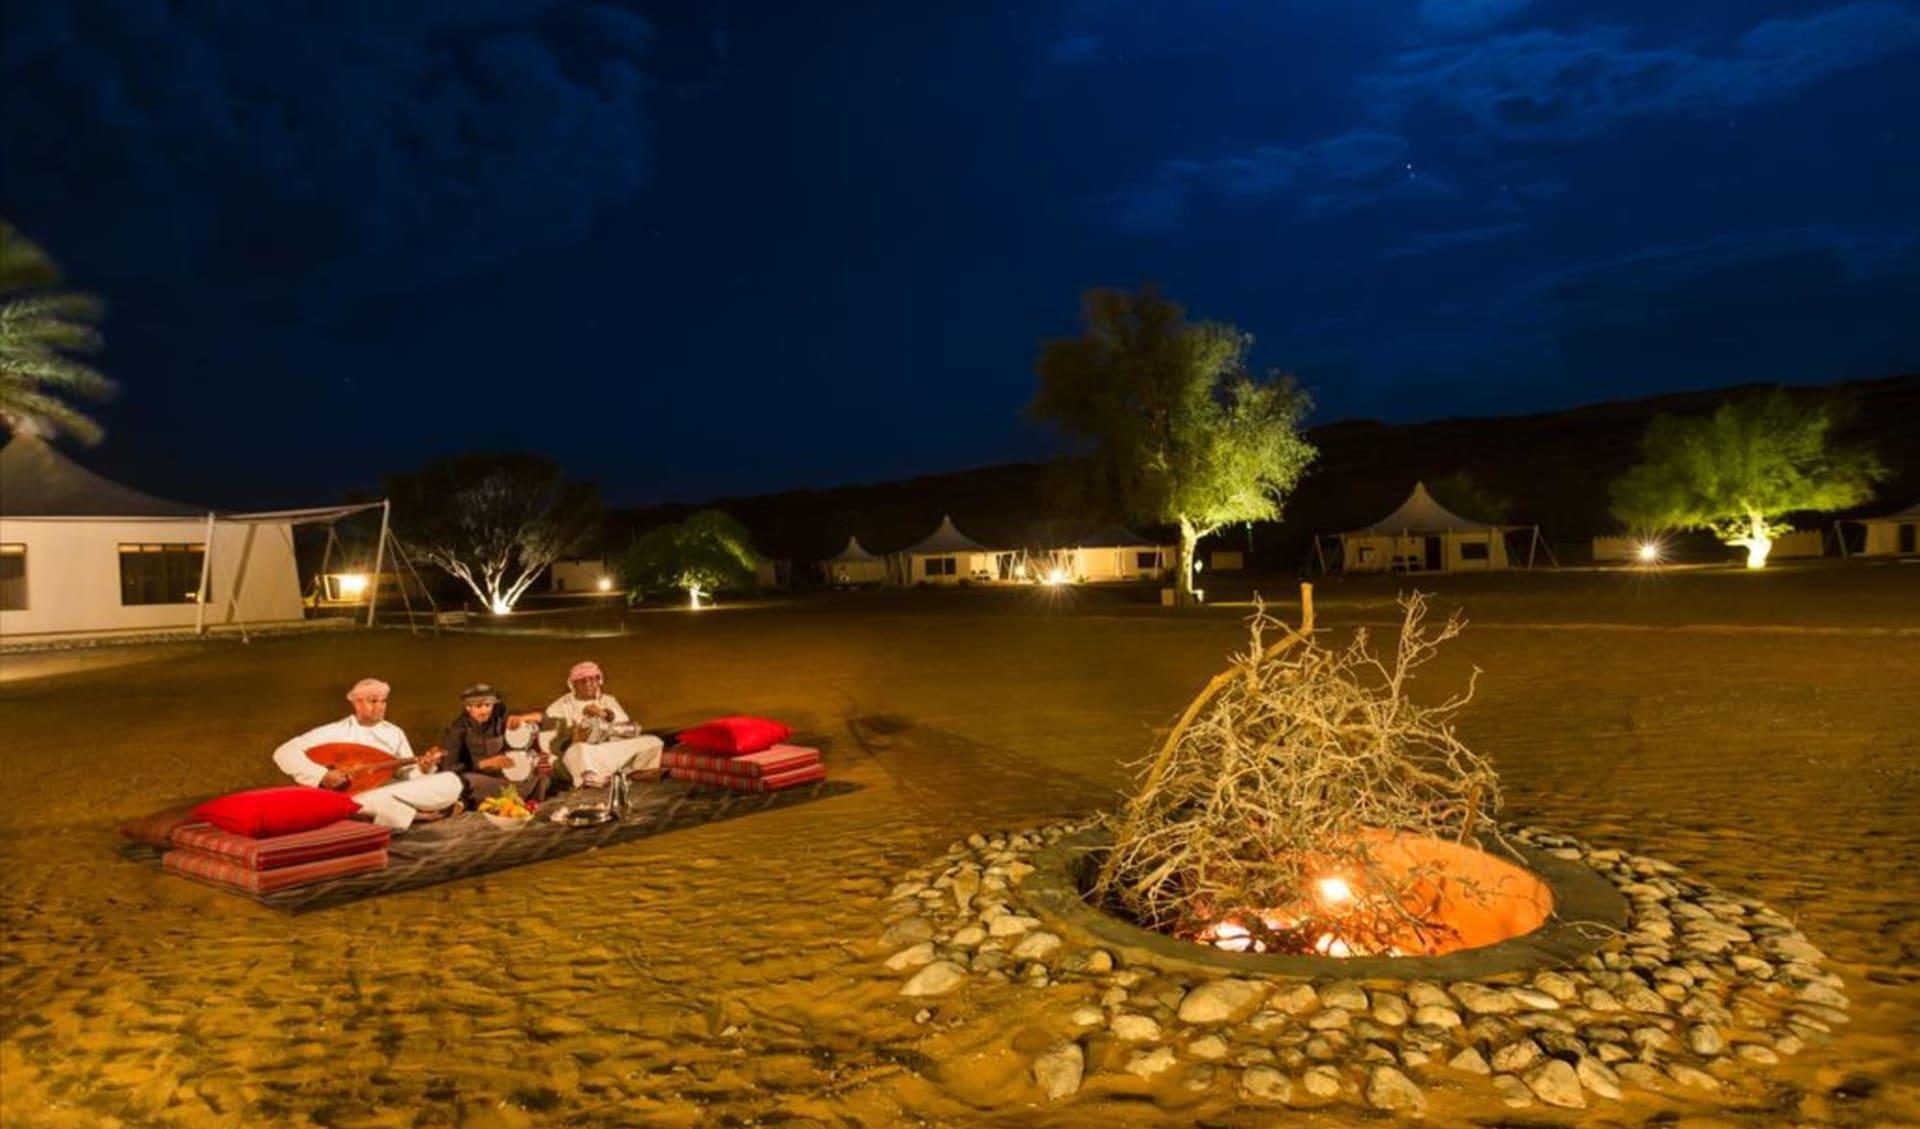 Desert Nights Camp in Wahiba Sands: